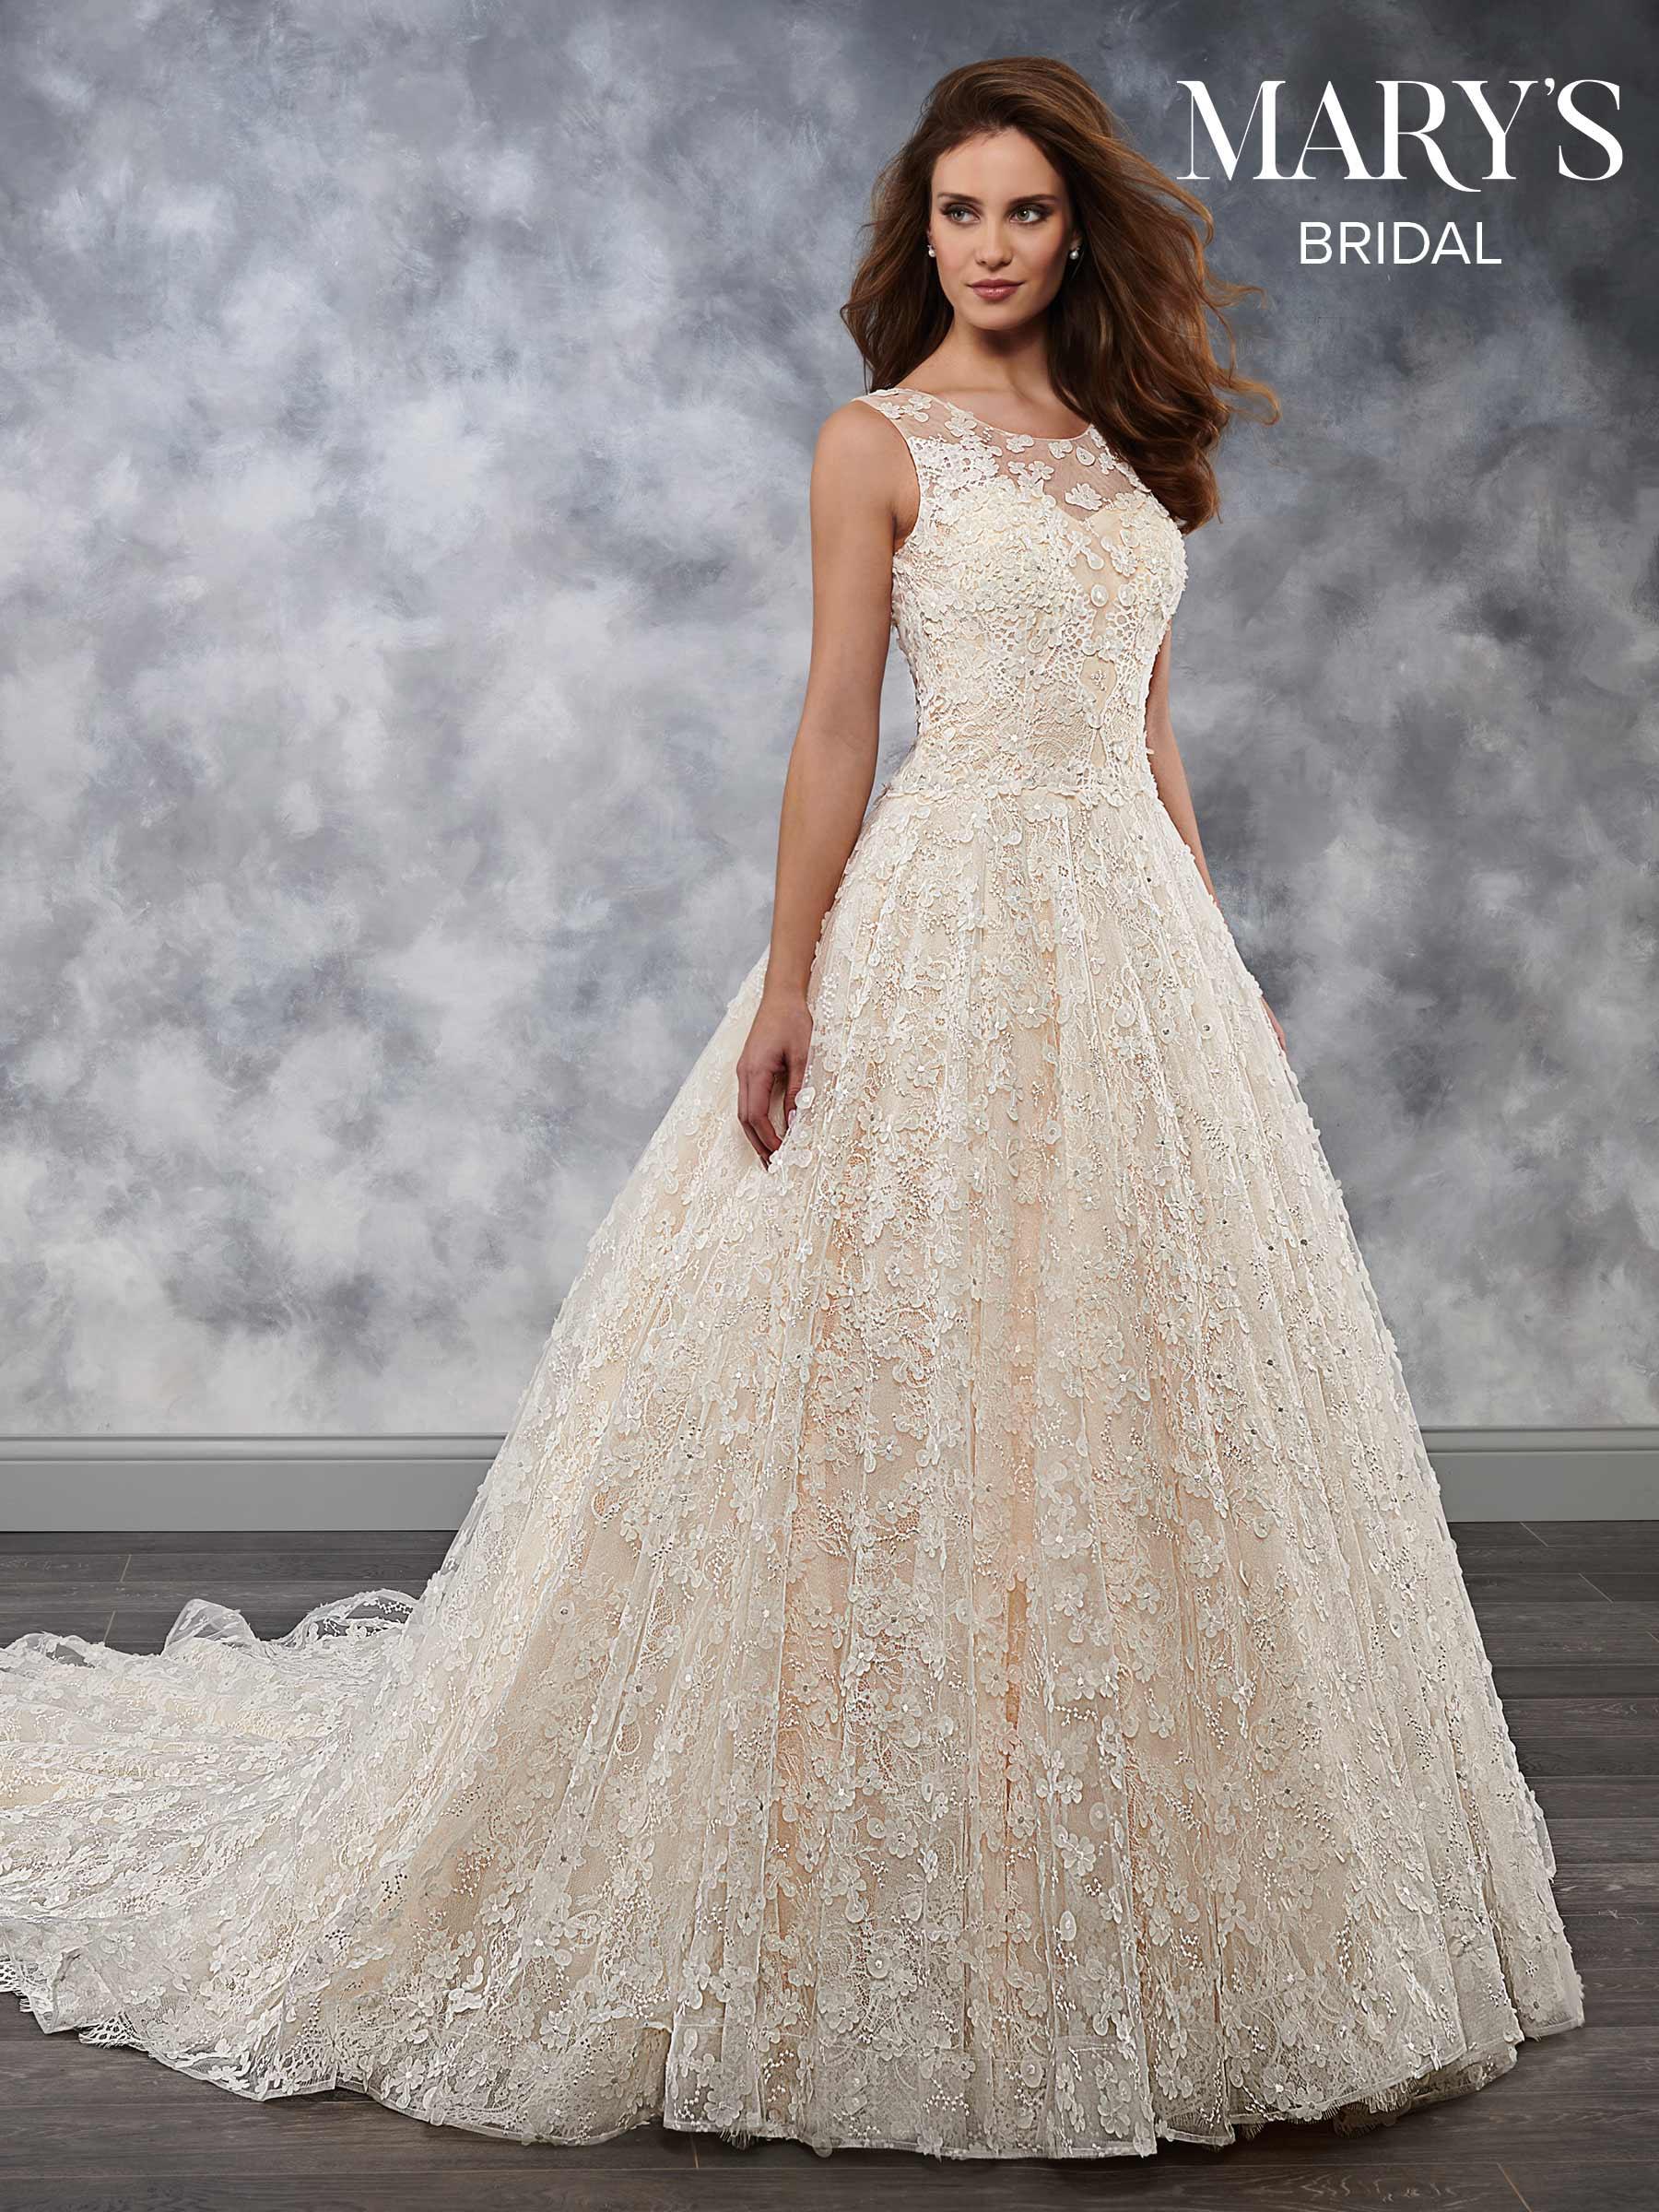 Bridal Wedding Dresses | Style - MB3037 in Ivory/Blush or White ...